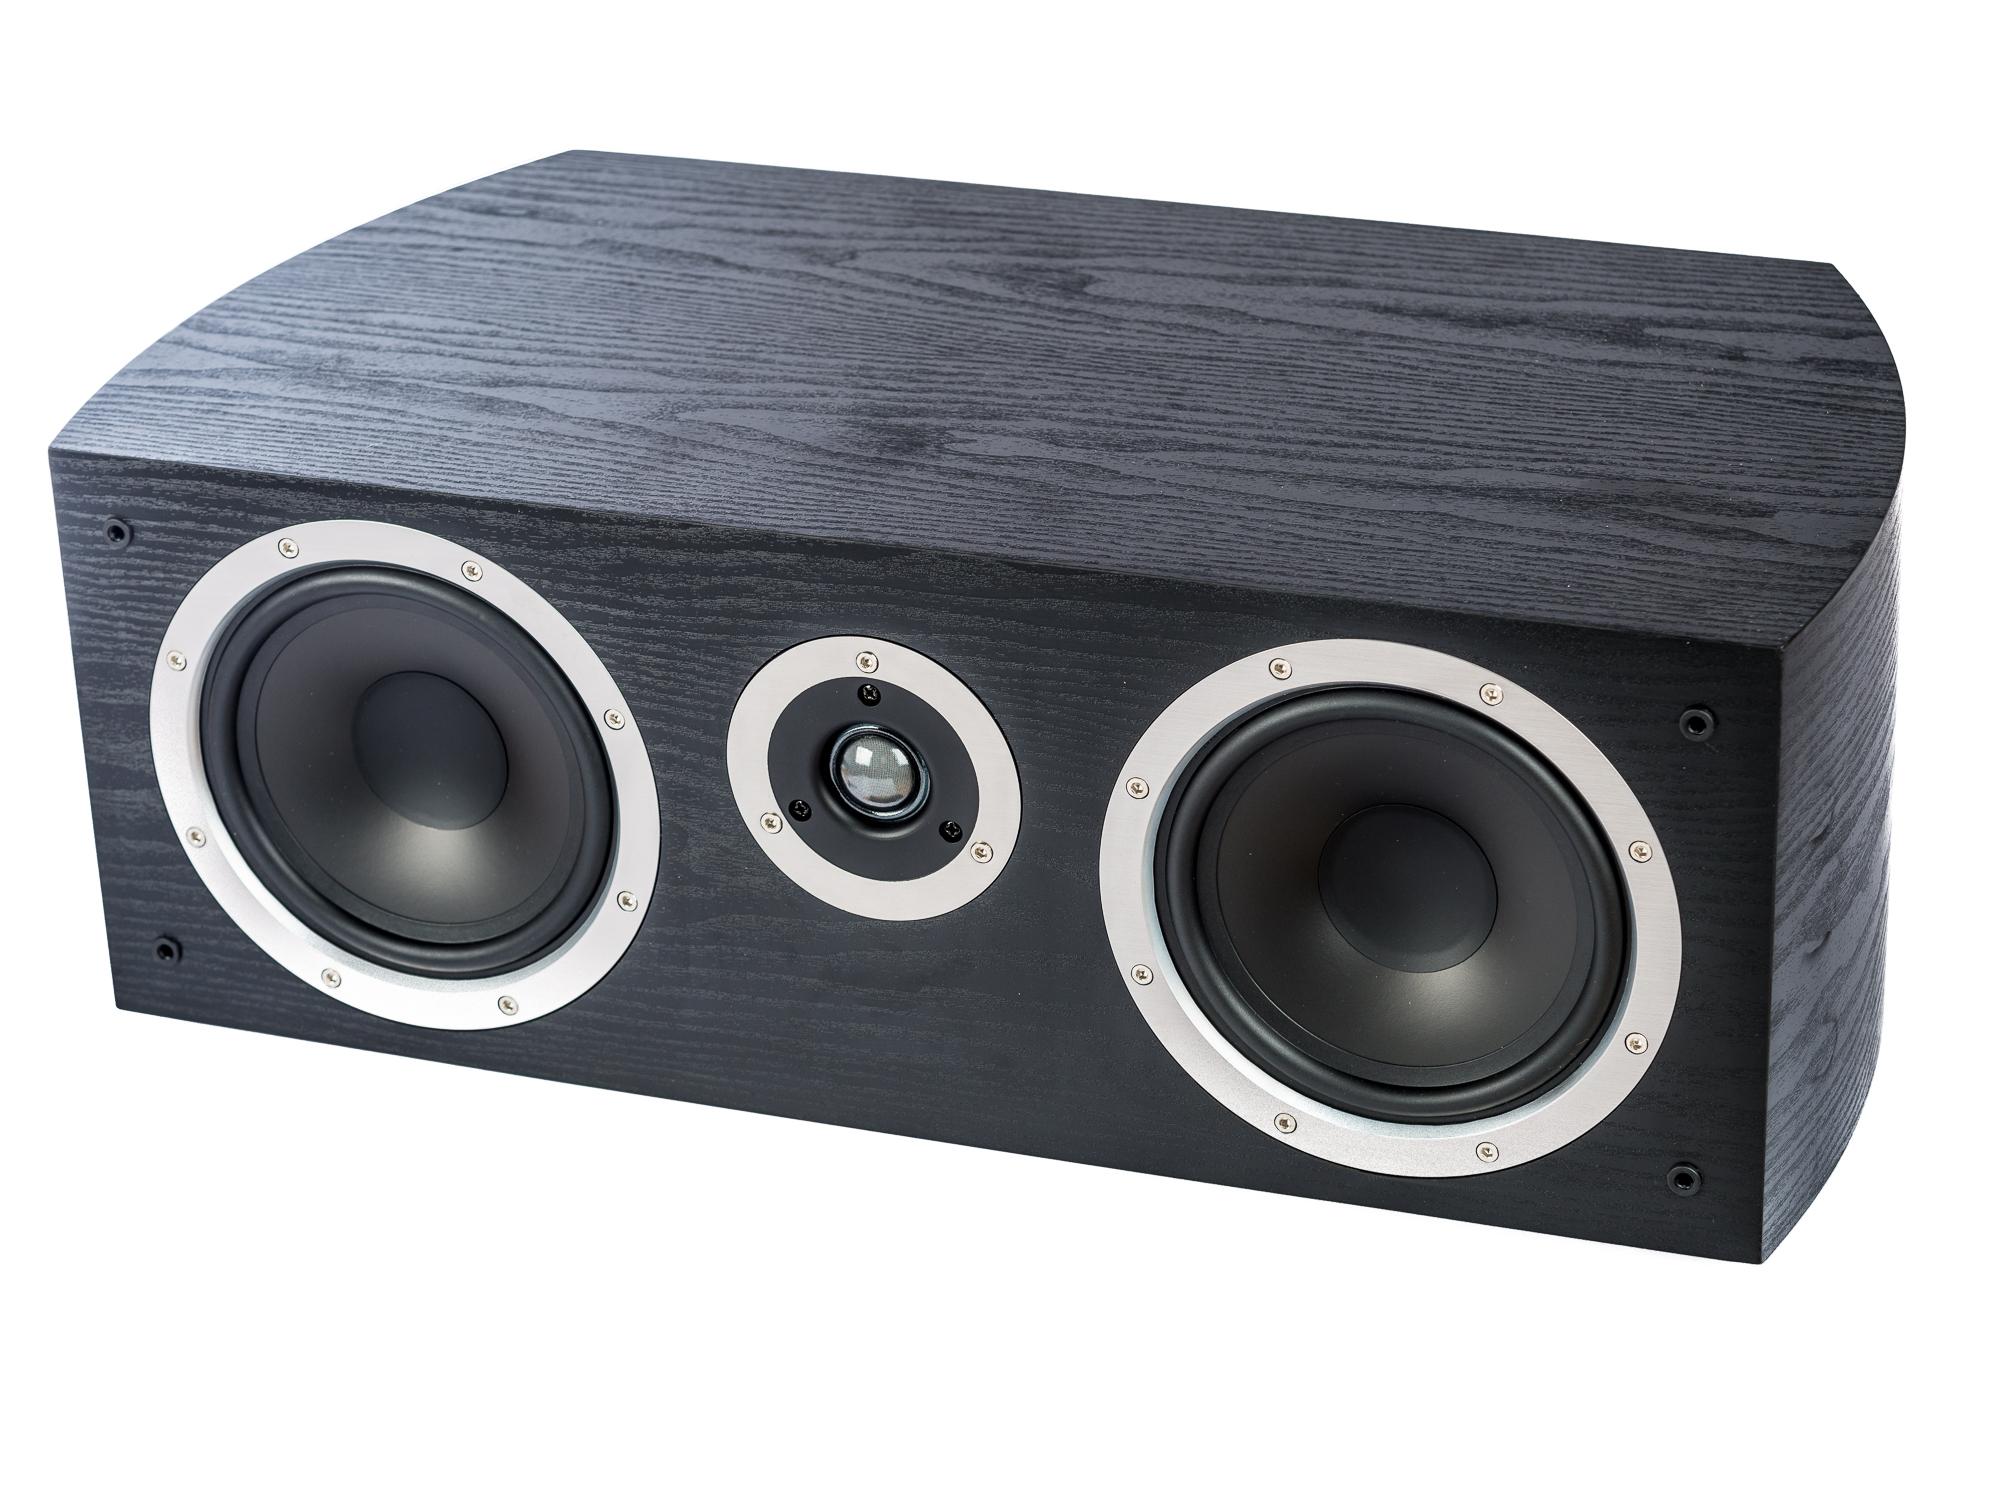 PG Audio universeller XL Center Lautsprecher, 2 Wege Bassreflex, schwarz, Neu-Ware – Bild 2